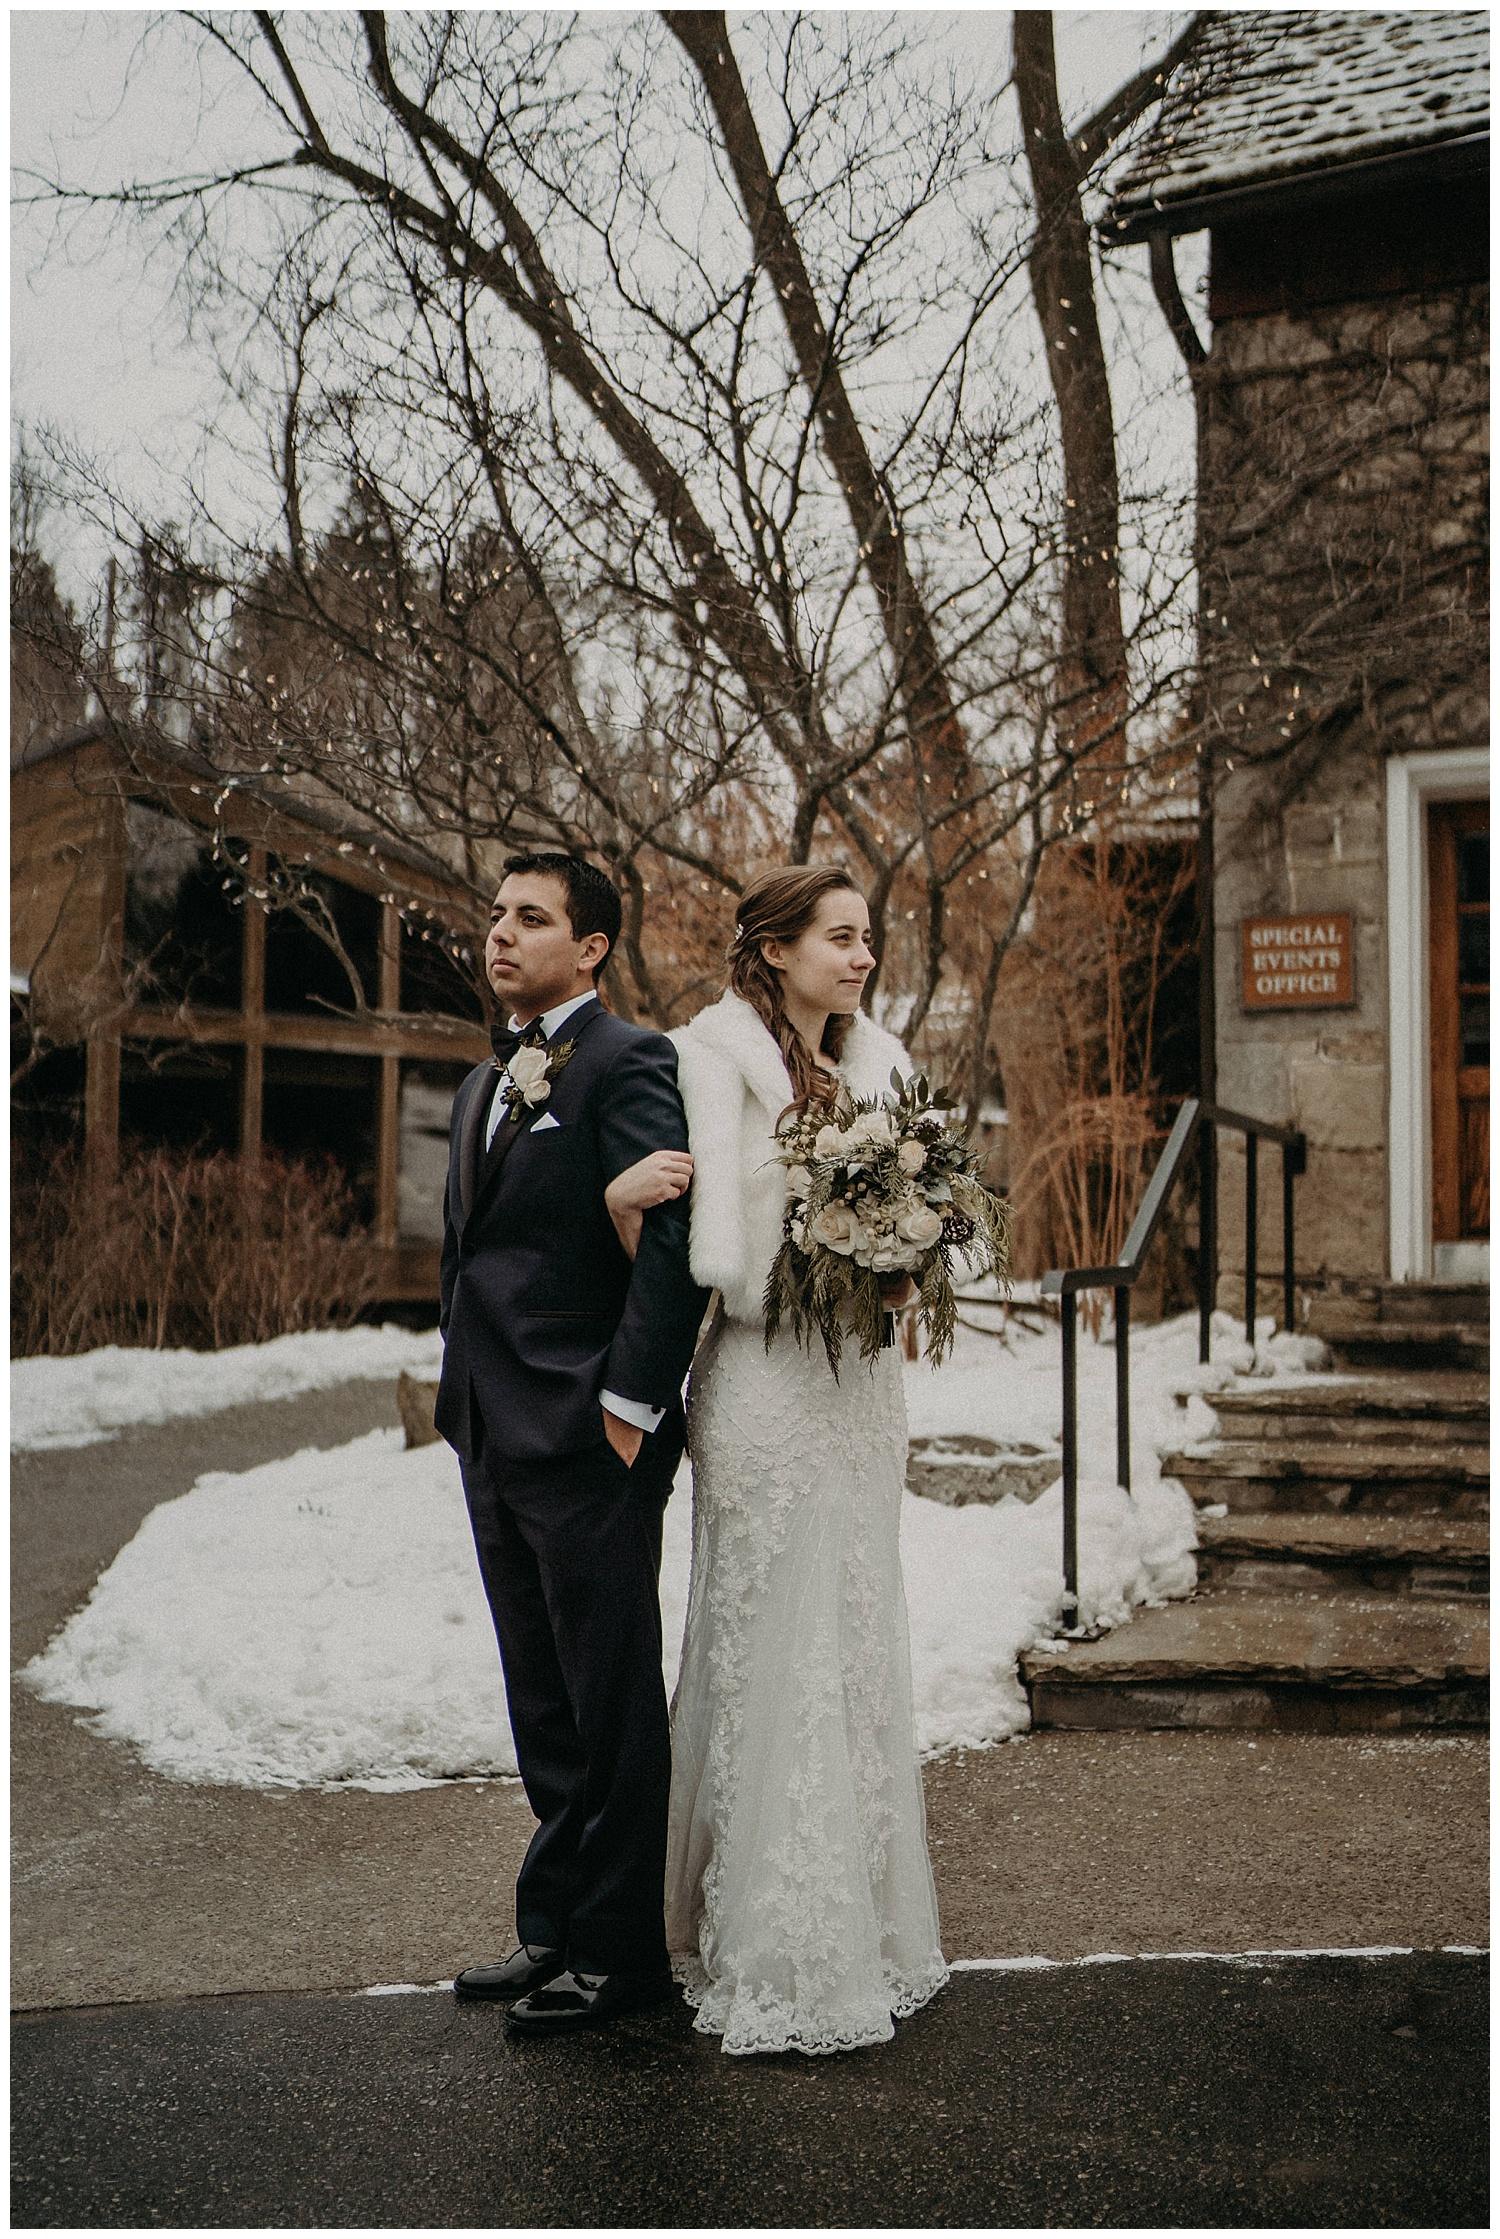 Katie Marie Photography | Hamilton Ontario Wedding Photographer | Ancaster Mill Winter Wedding | Oakville Conference Centre Wedding | RBG Wedding | Royal Botanical Gardens Wedding_0202.jpg